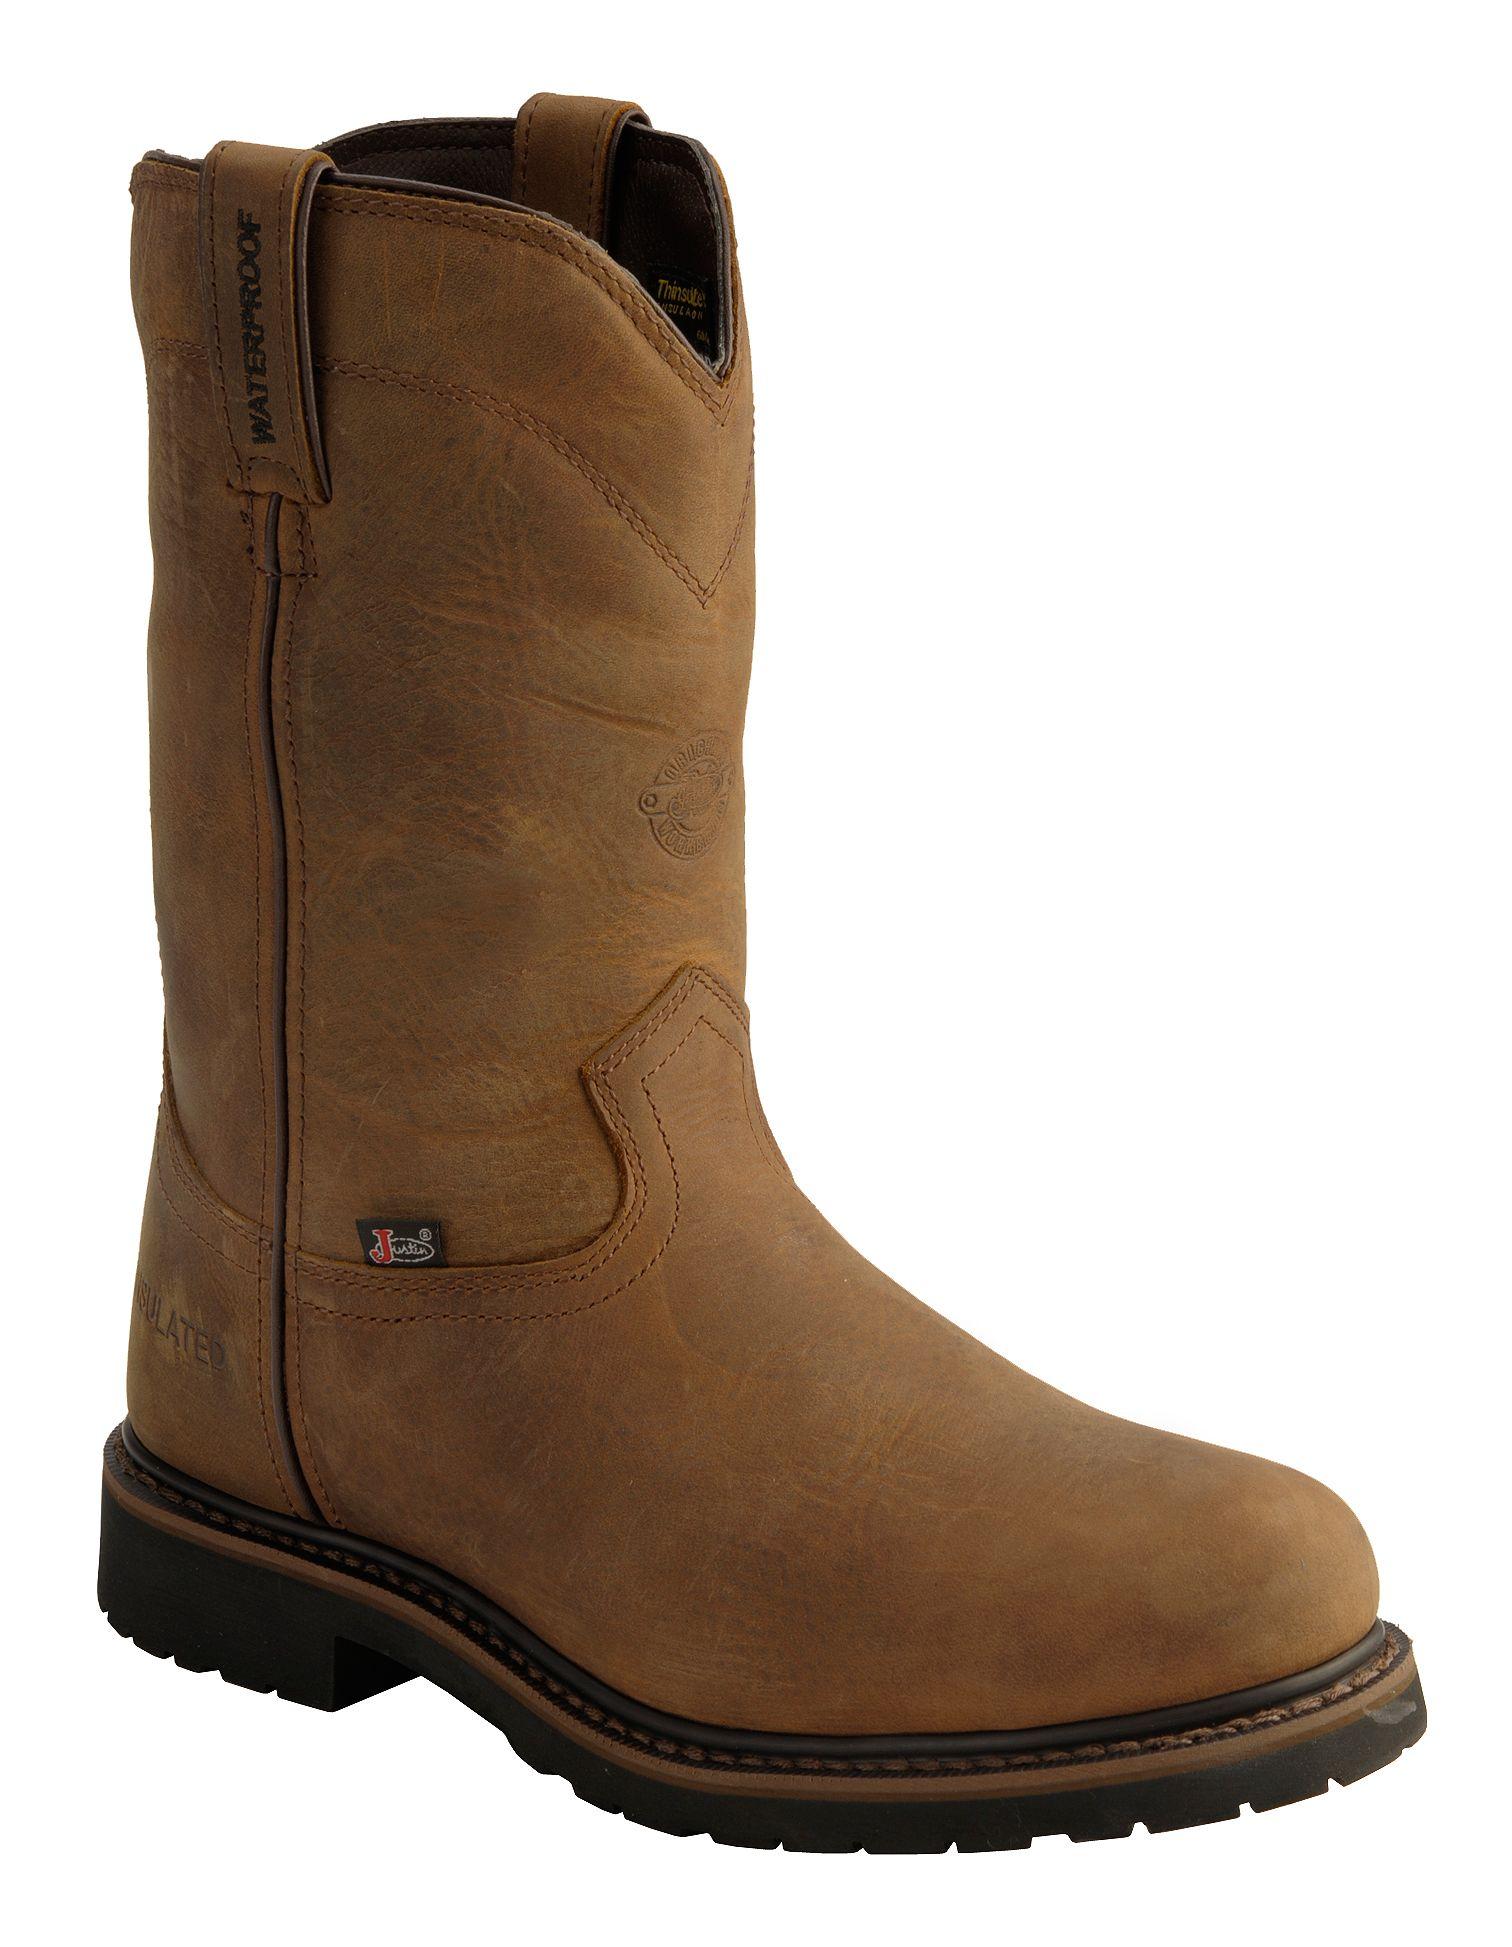 Justin Wyoming Insulated Waterproof Work Boots Steel Toe